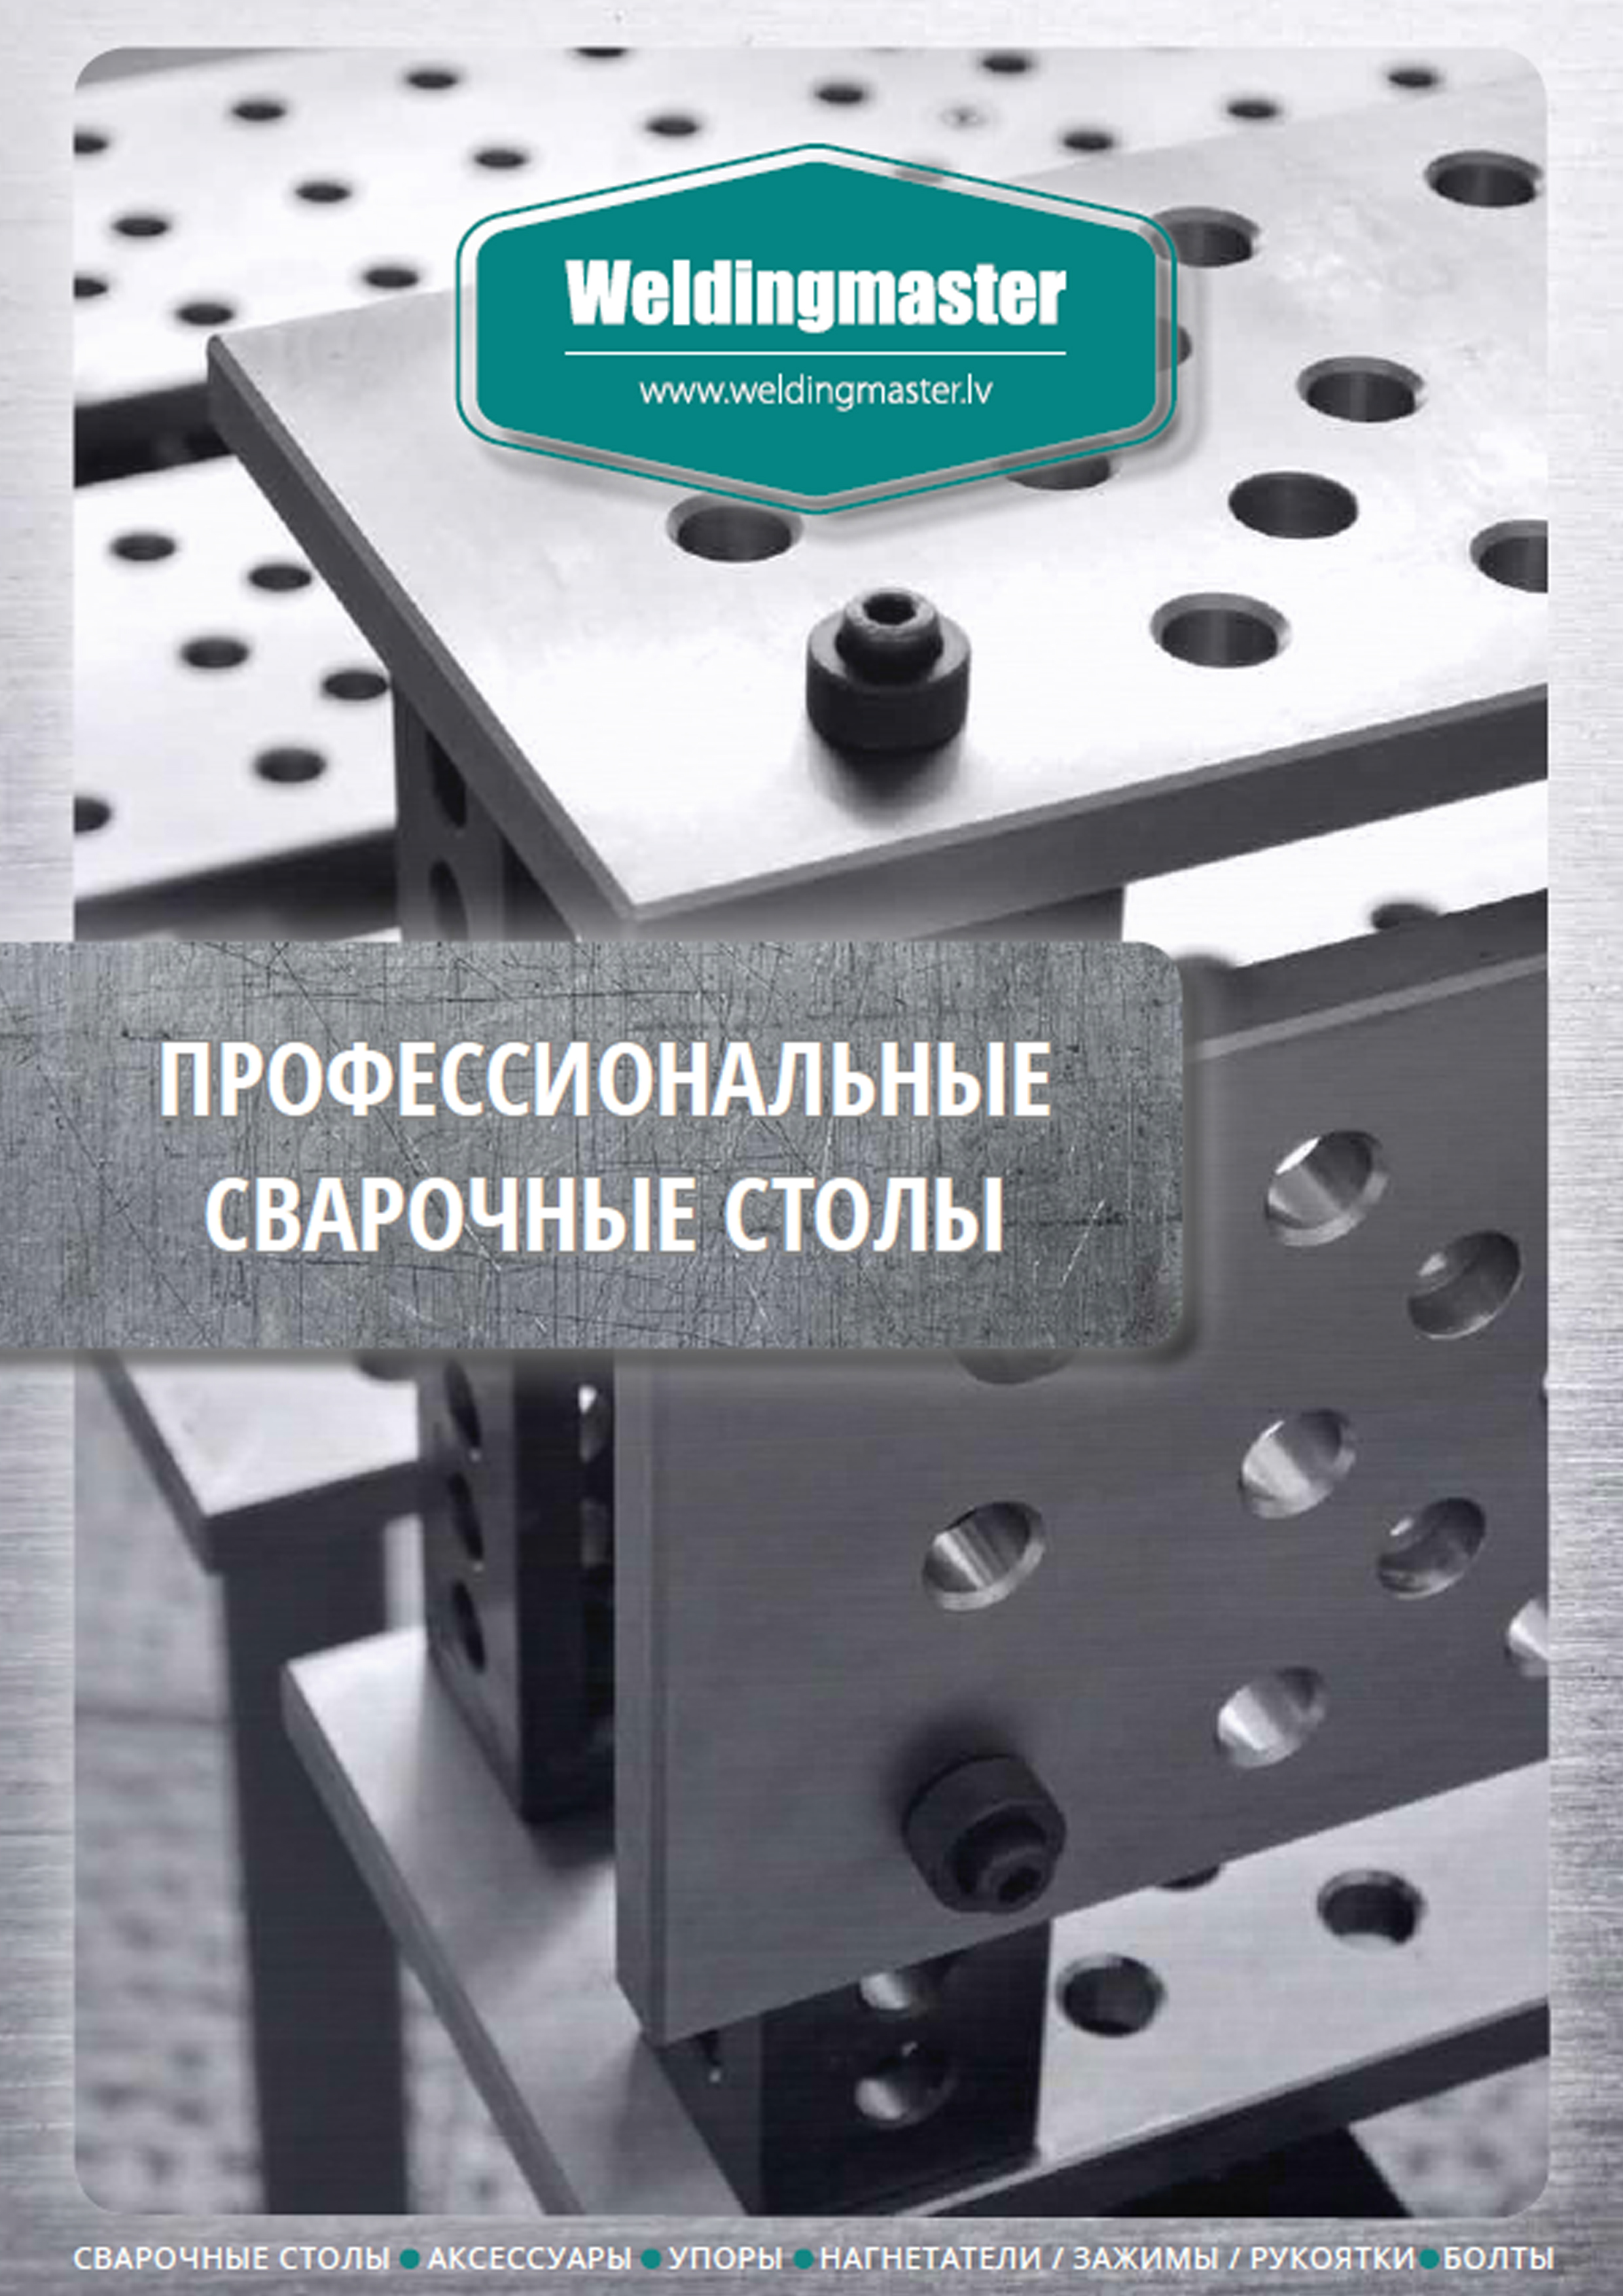 weldingmaster-cat-mvgrp